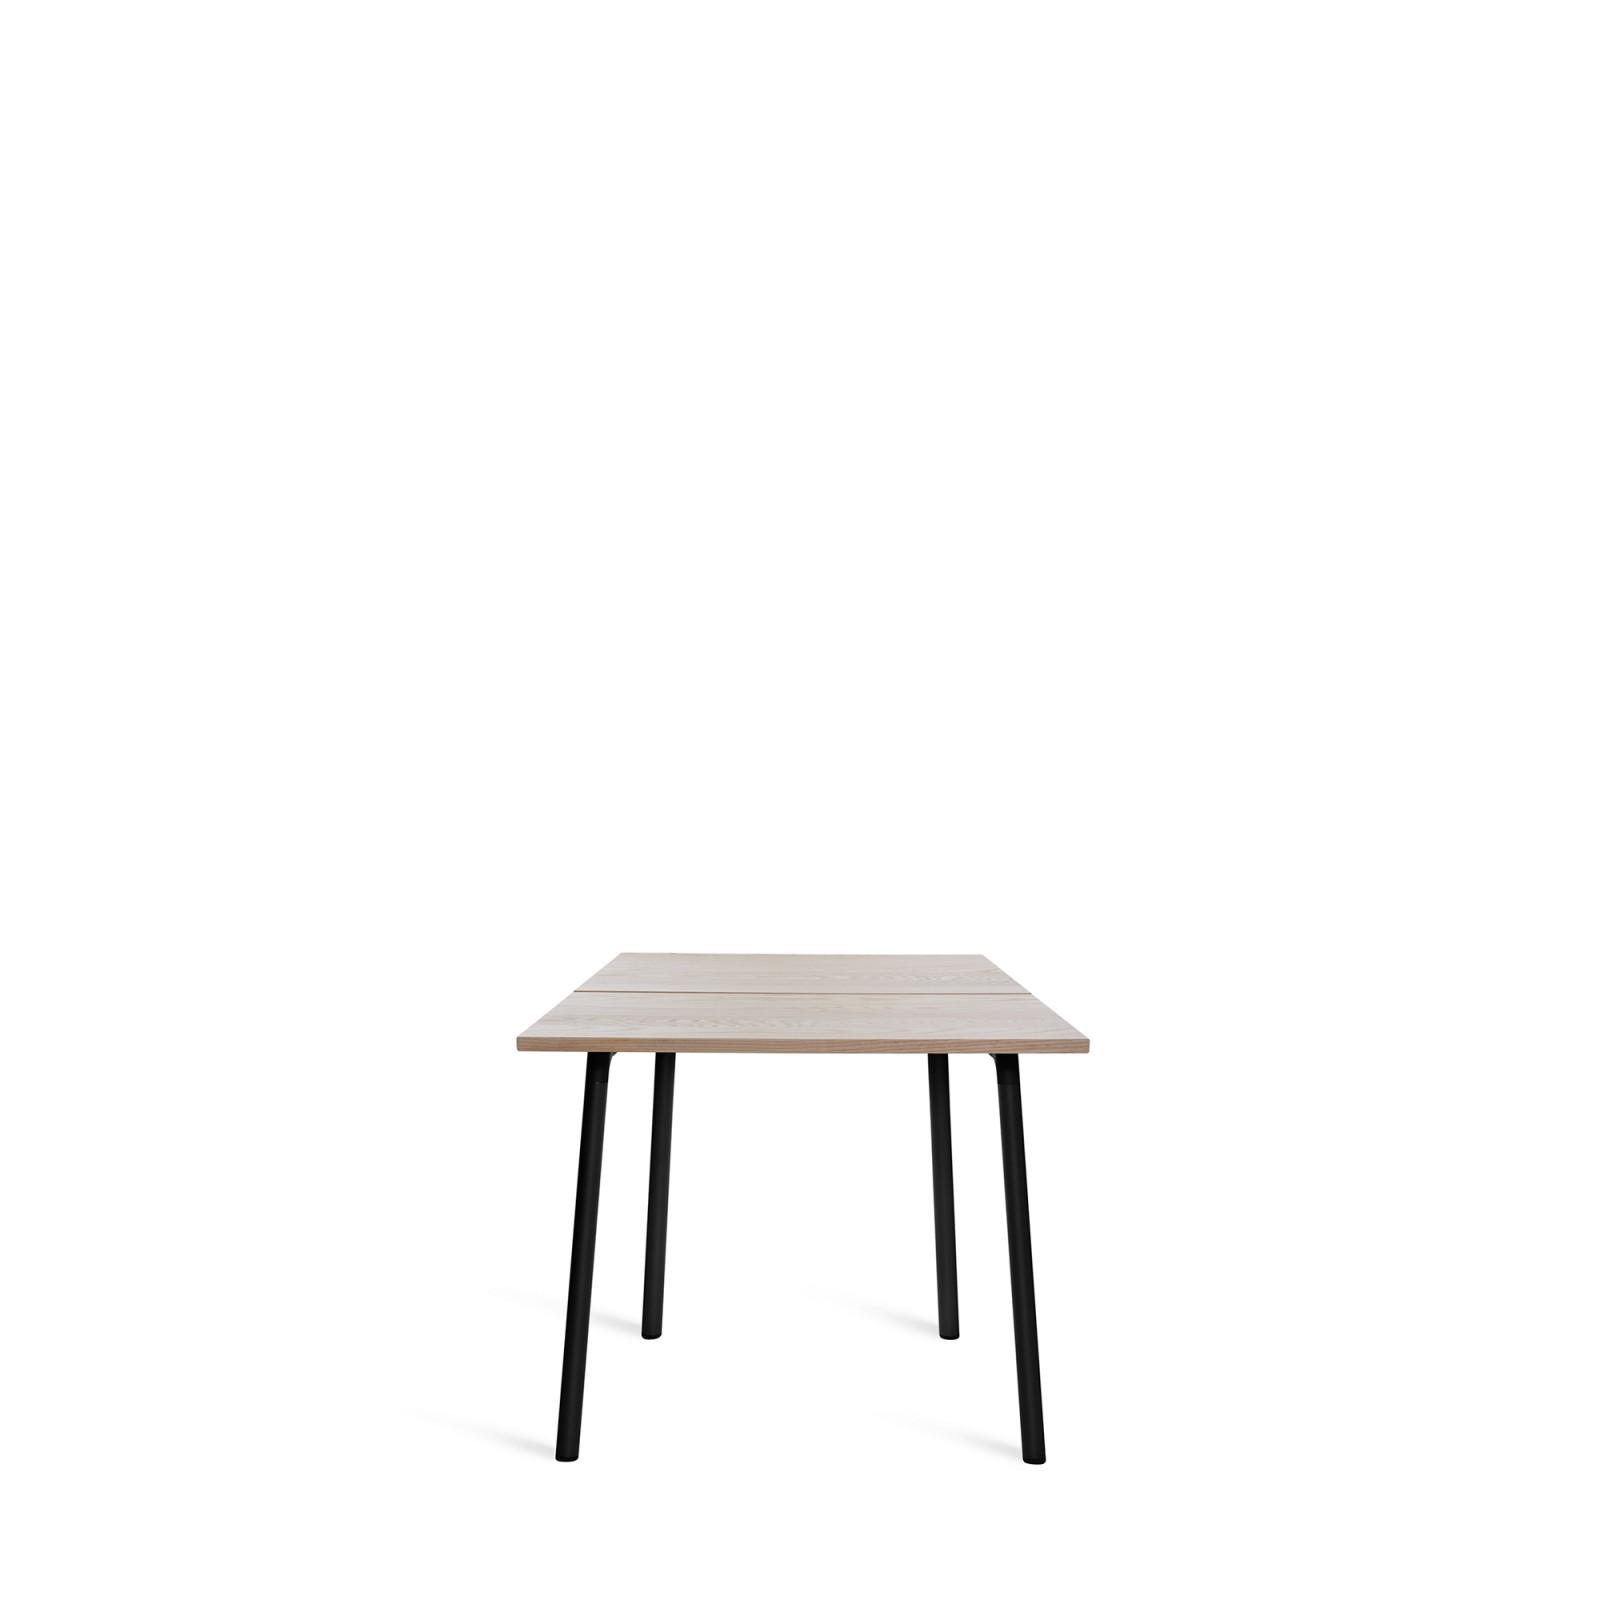 Run Dining Table 83cm, Black, Ash Top